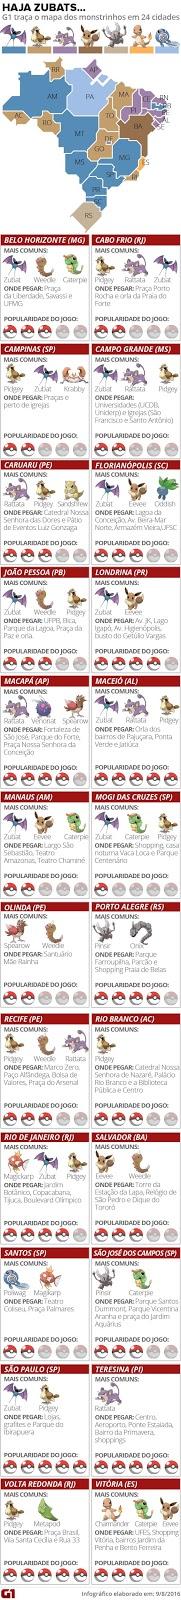 http://g1.globo.com/tecnologia/games/noticia/2016/pokemon-go-pelo-brasil-mapa